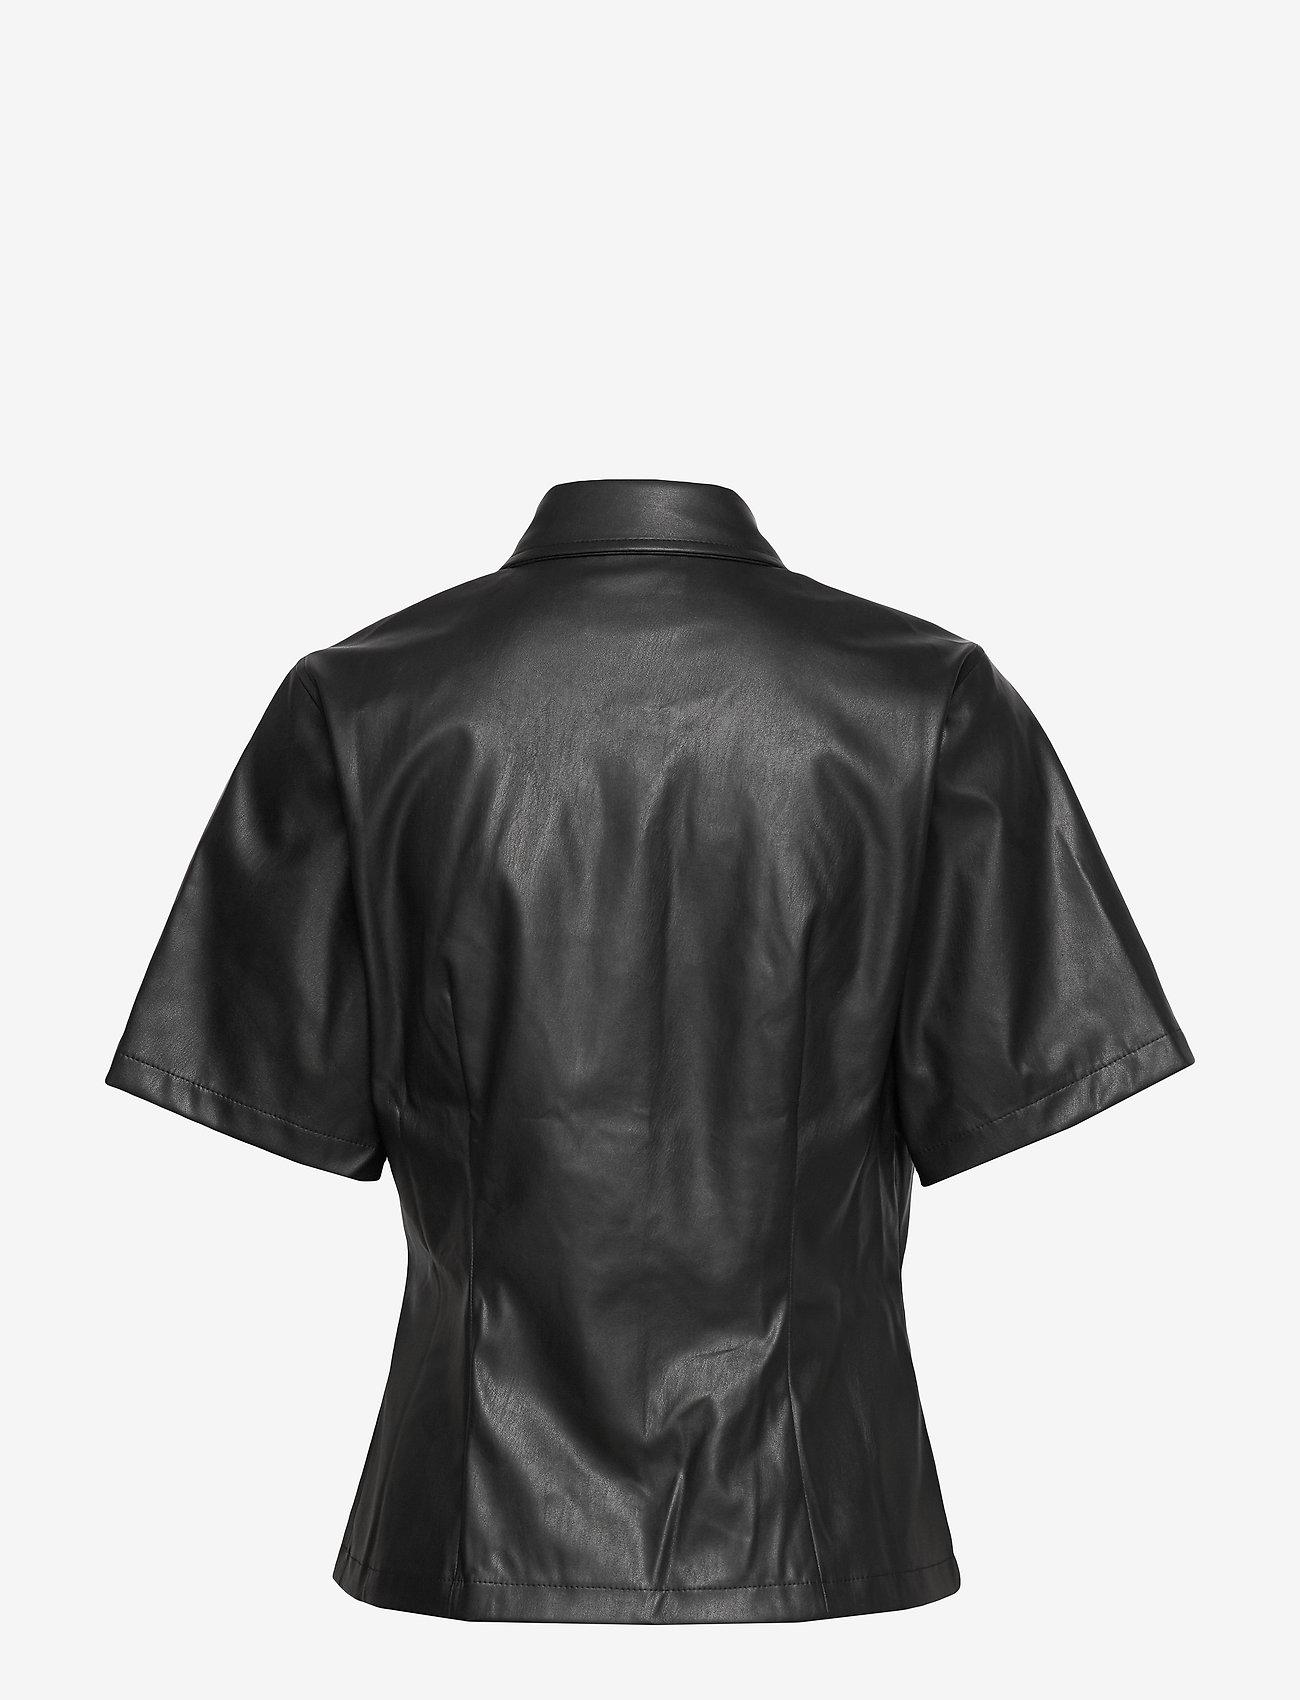 New Skin Shila (Black) (89.40 €) - Mads Nørgaard 6NzyY